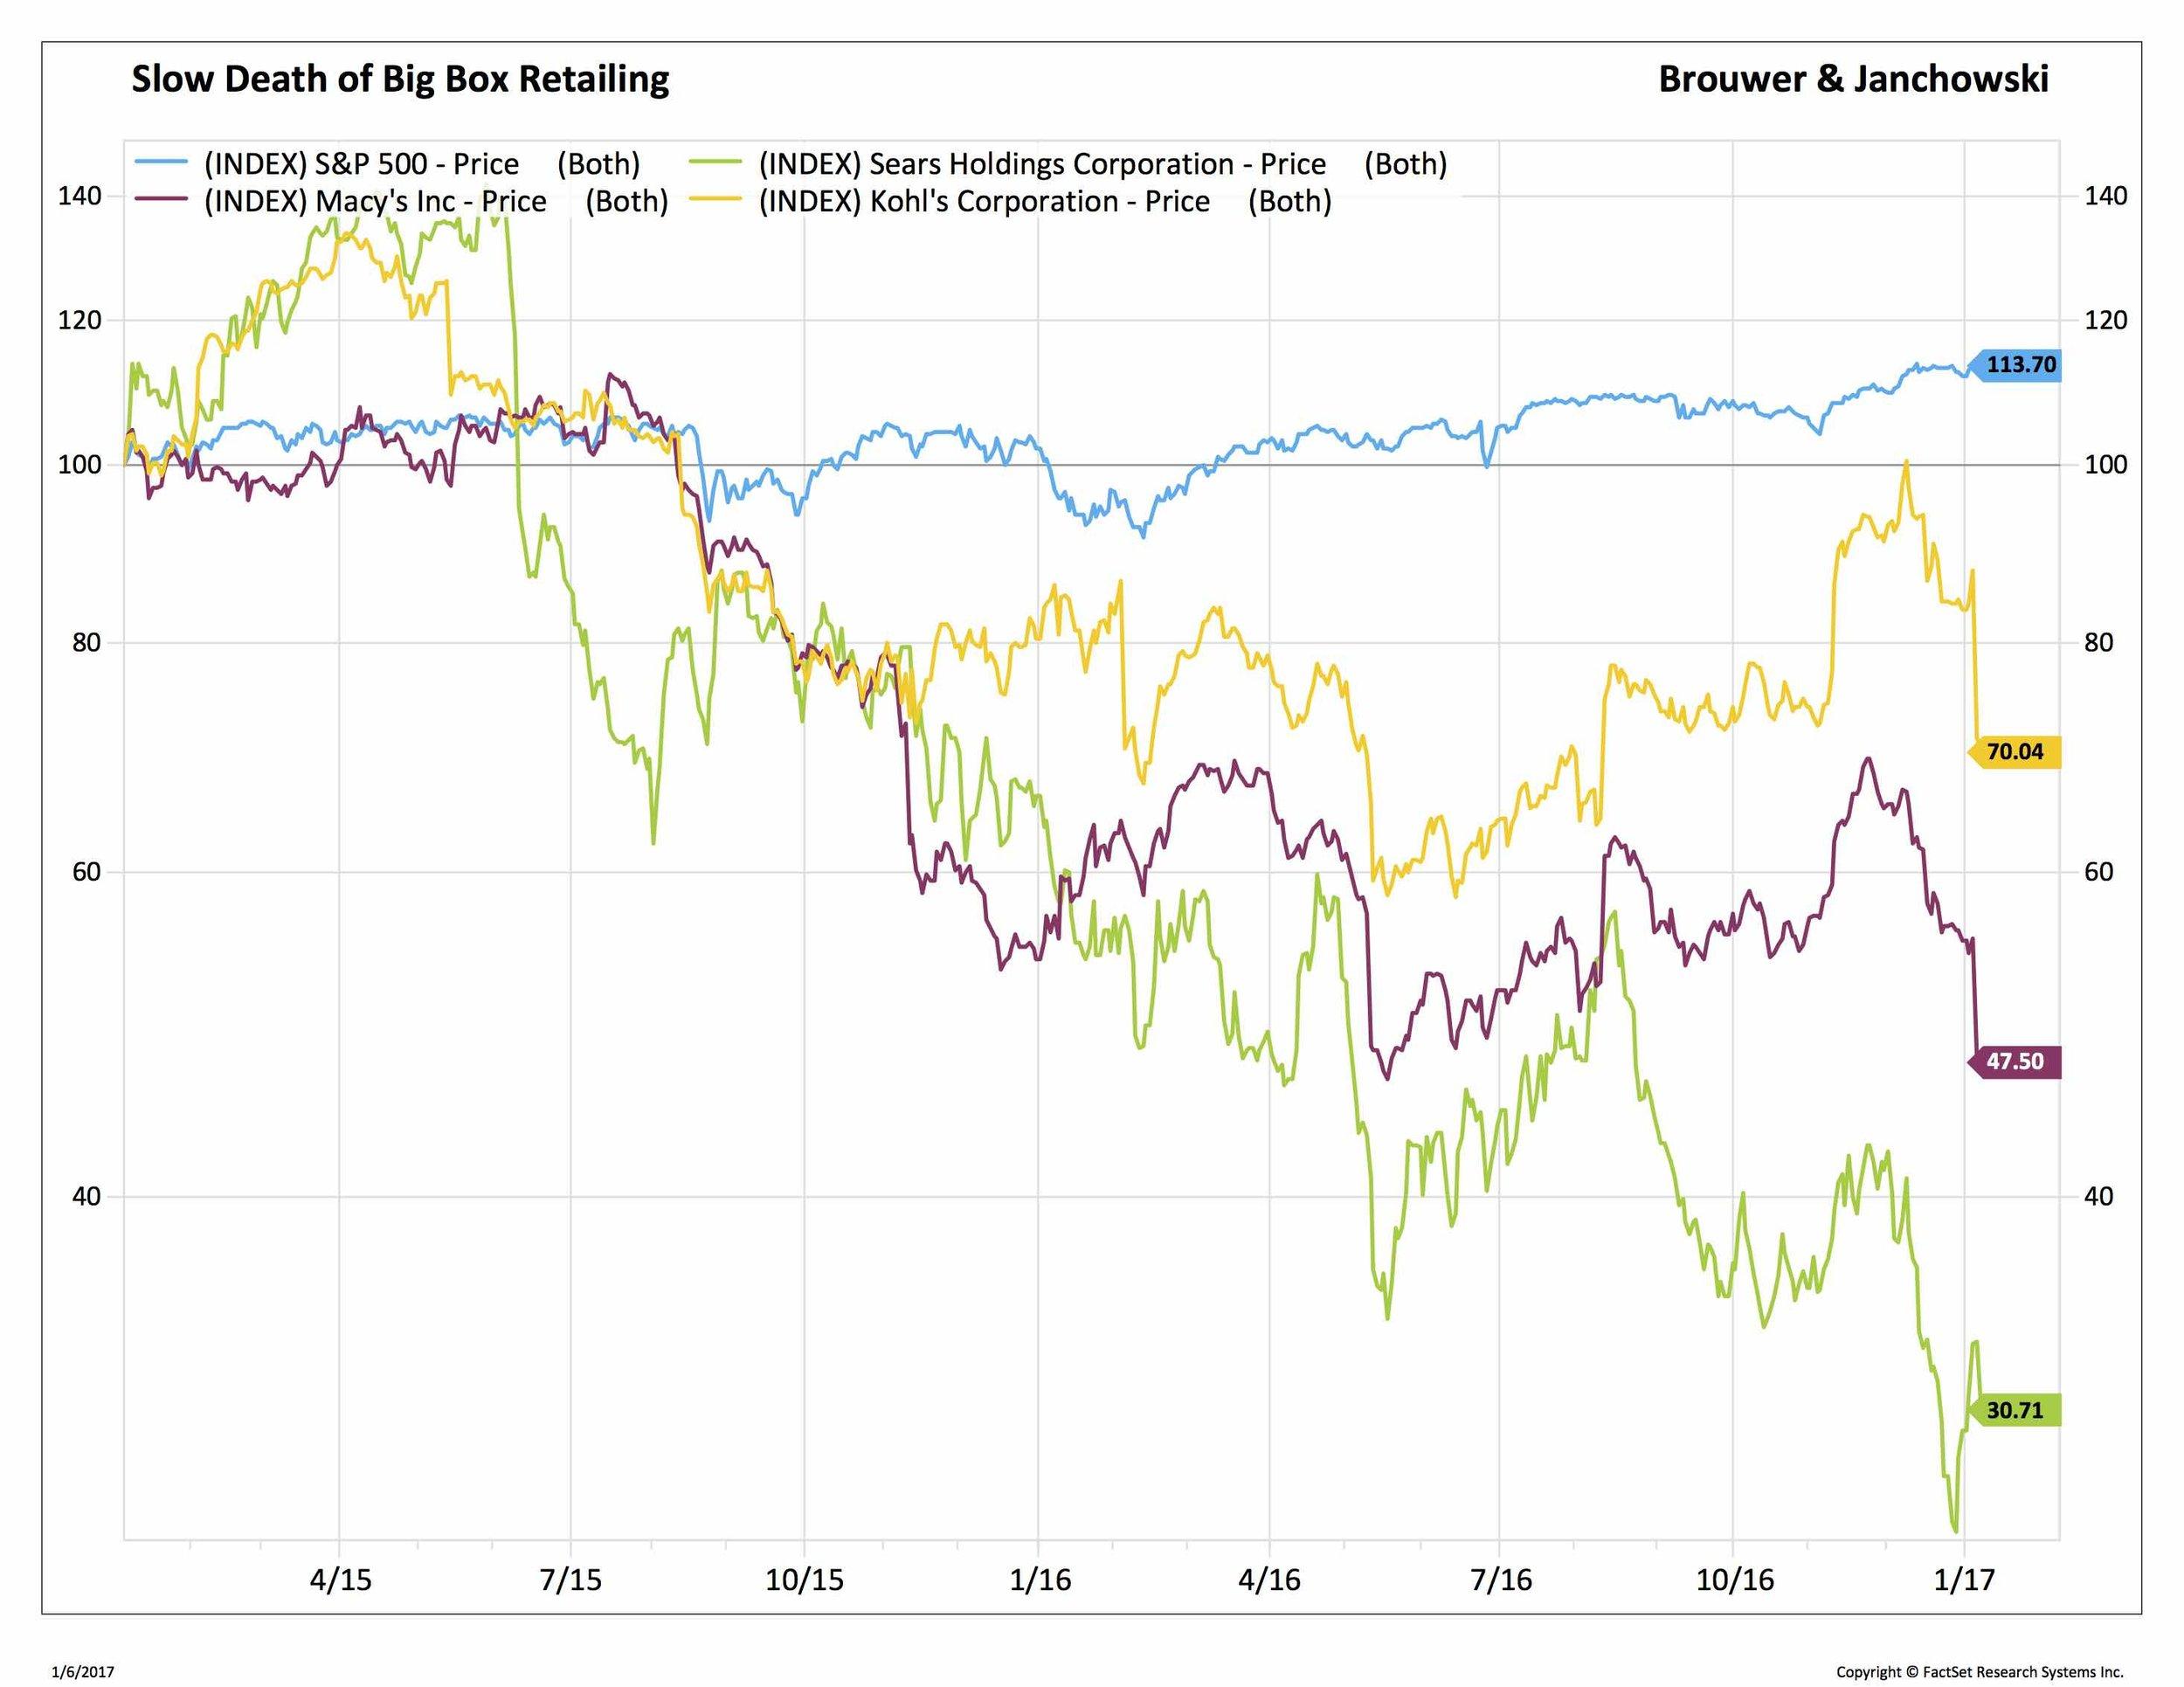 Brouwer and Janachowski - Slow Death of Big Box Retailing